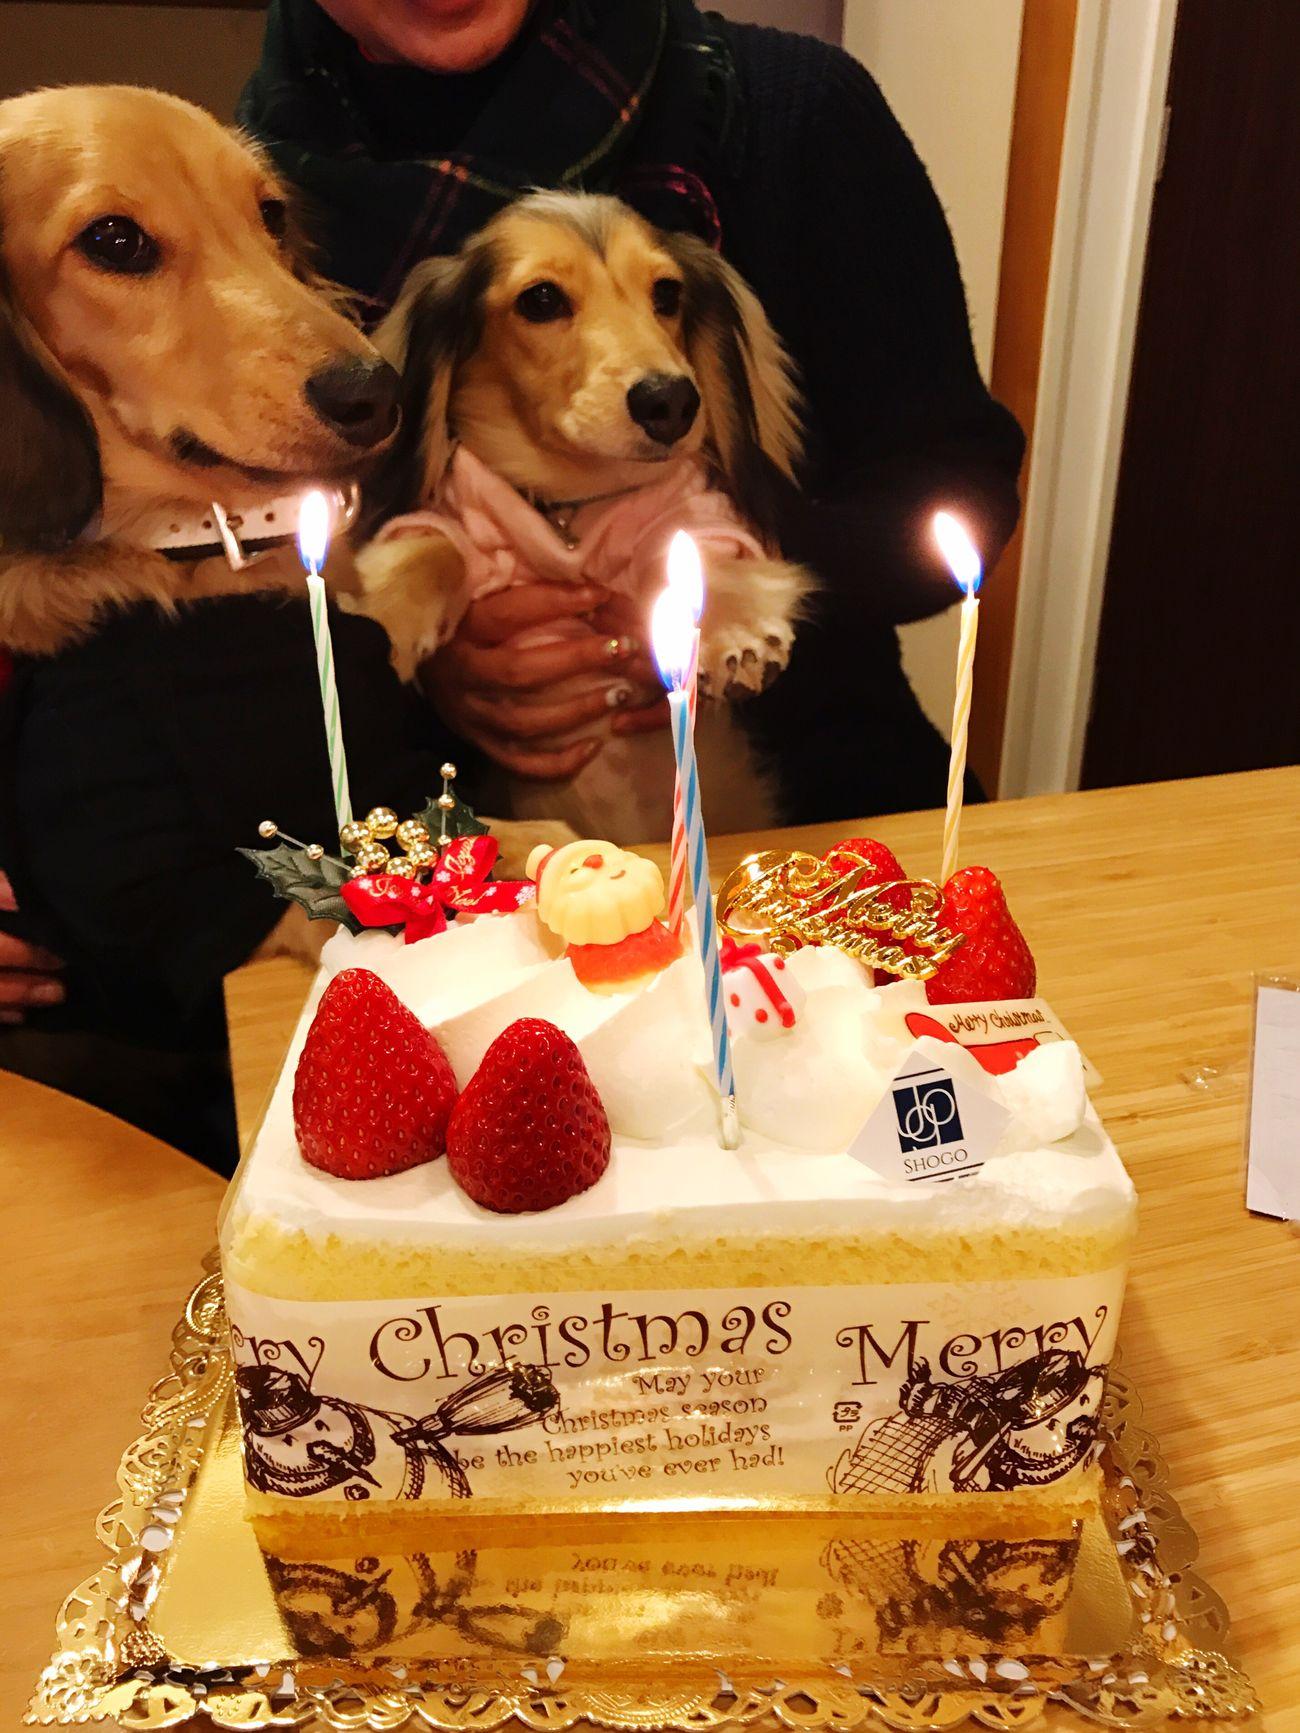 Merry Christmas Dog Sweet Food Minituredachshund